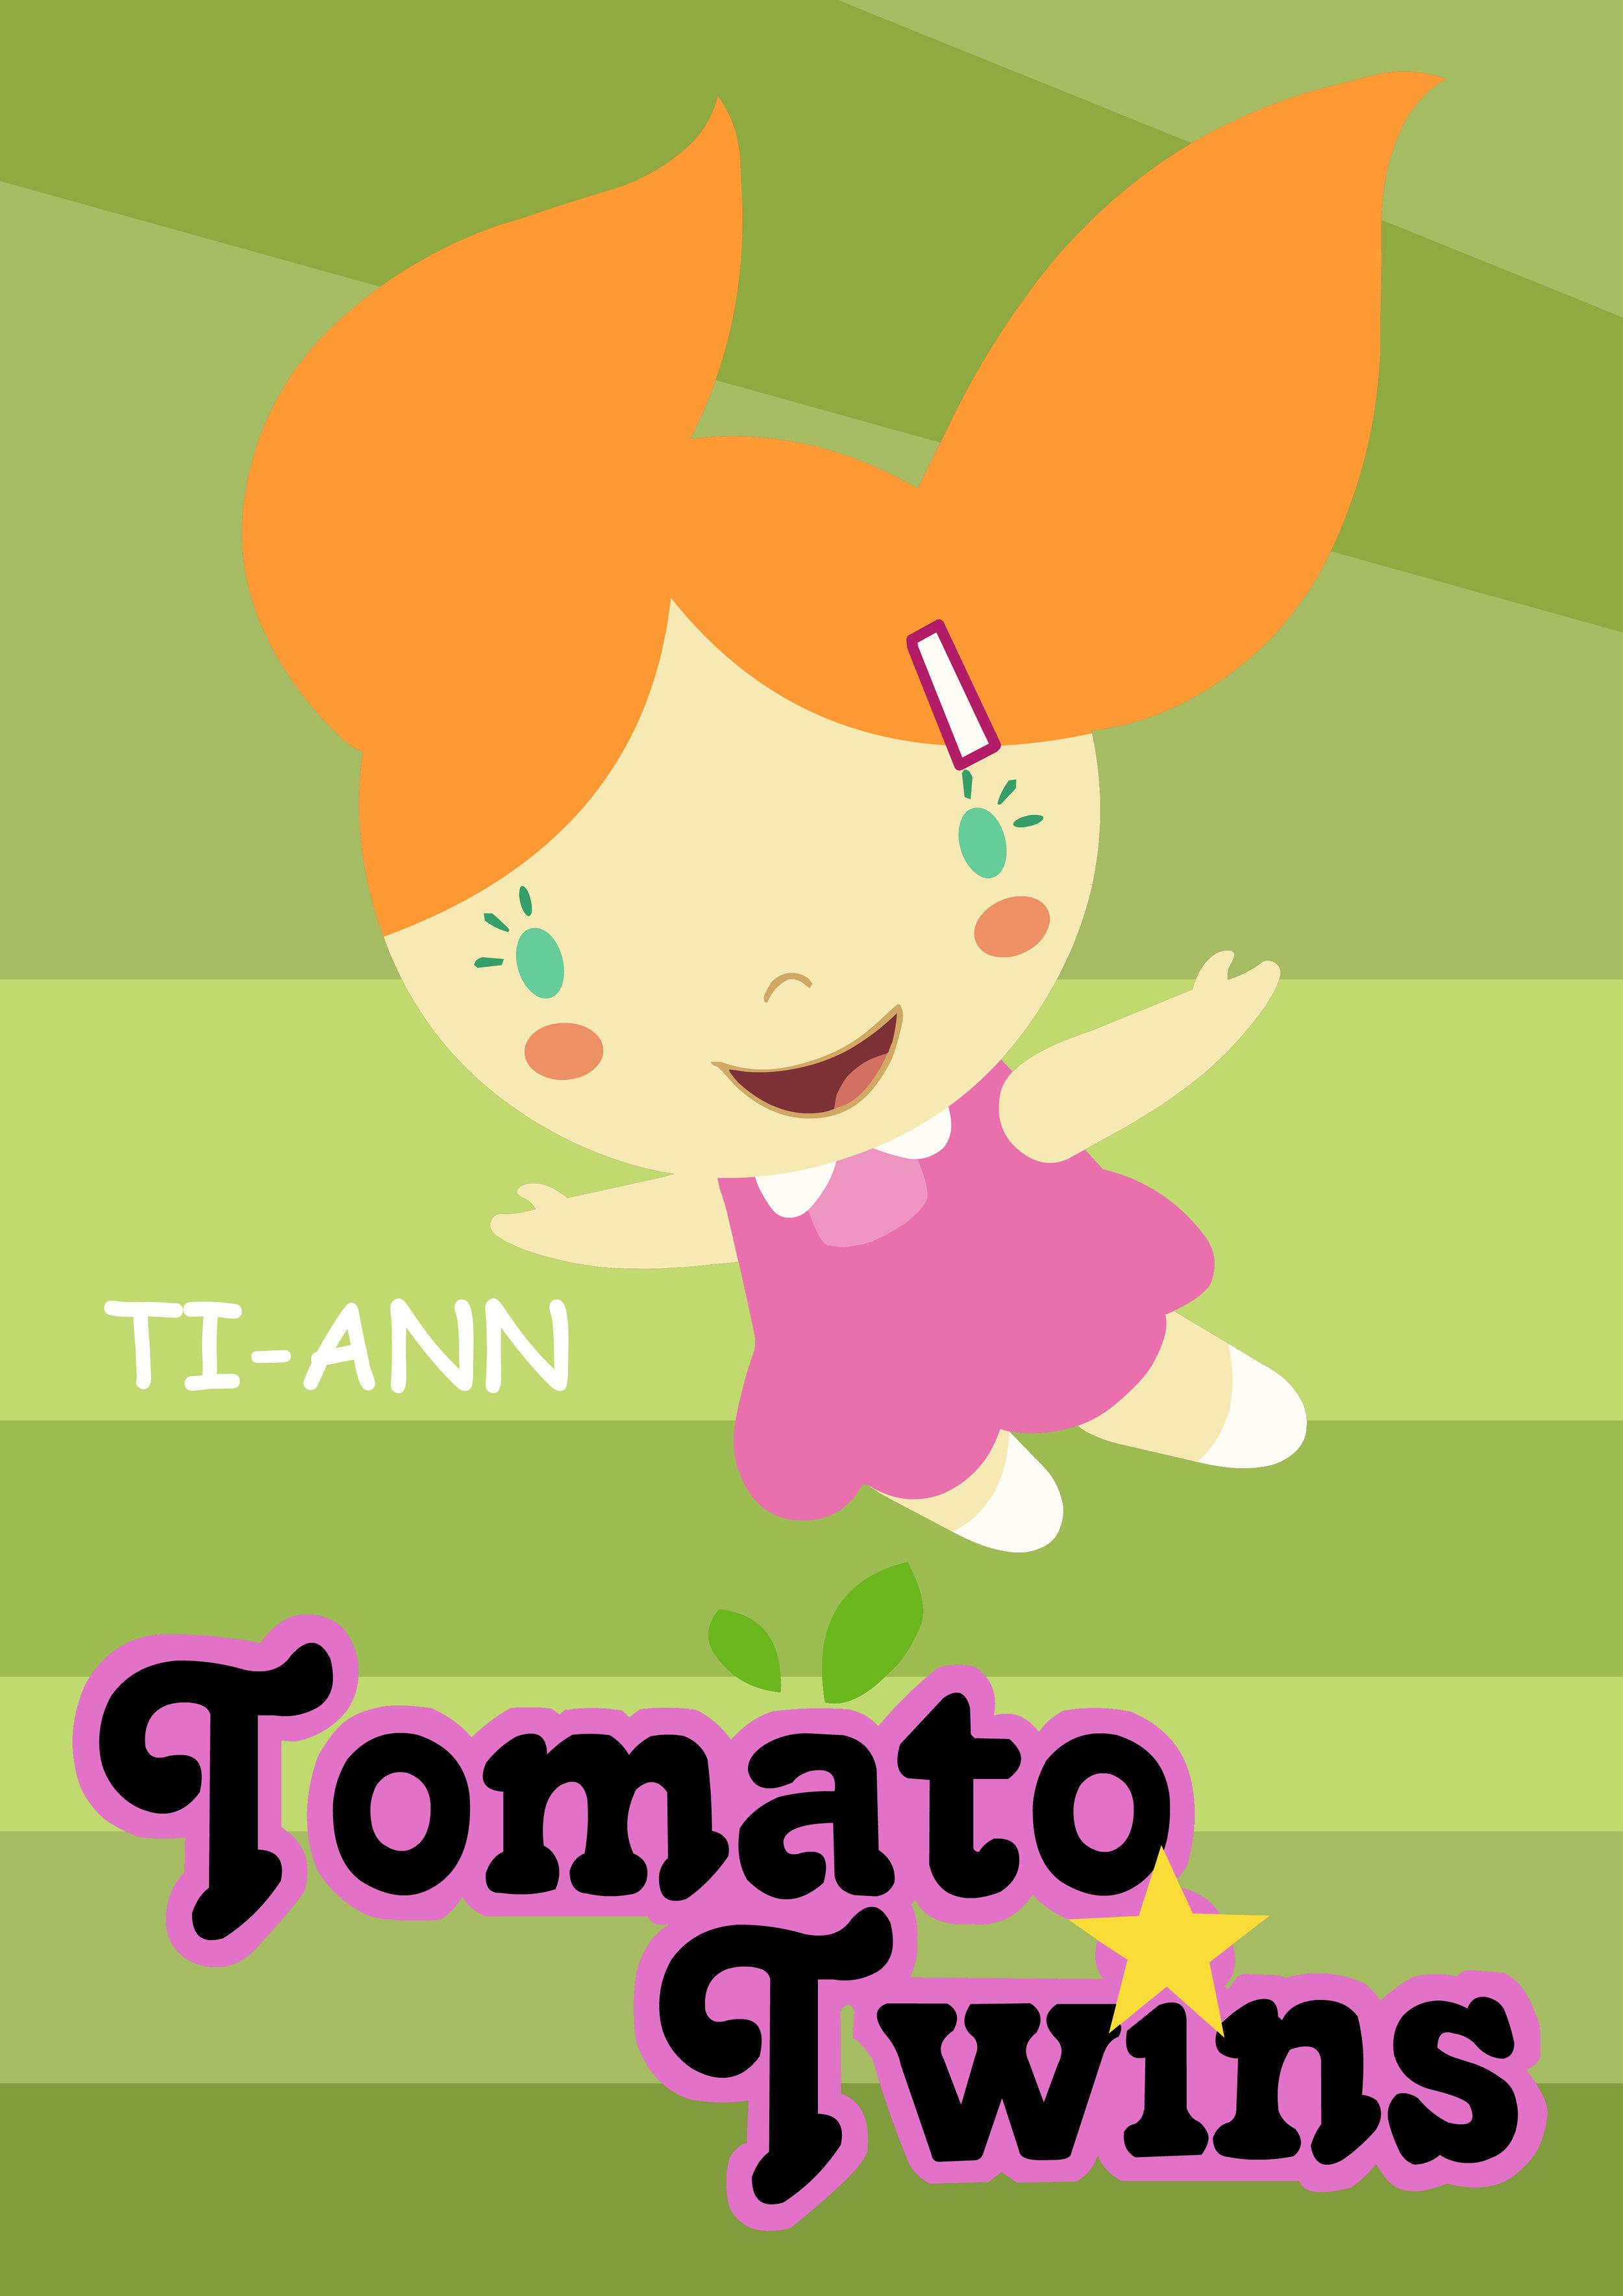 TomatoTwins_Poster_Ti-ann.jpg